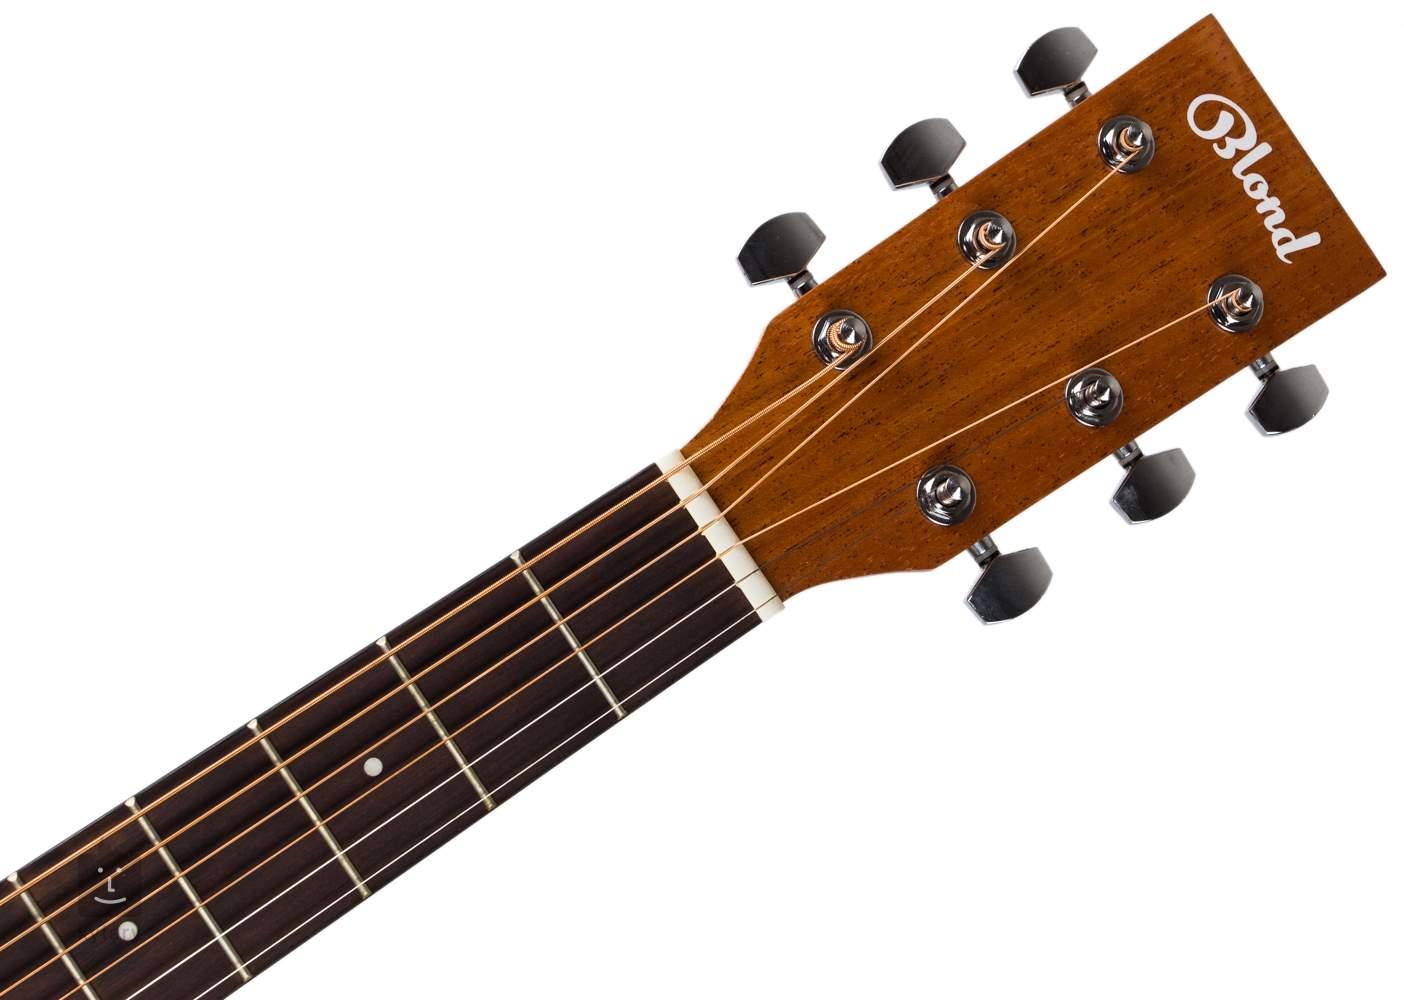 Blond Dn 1m Akusticka Kytara